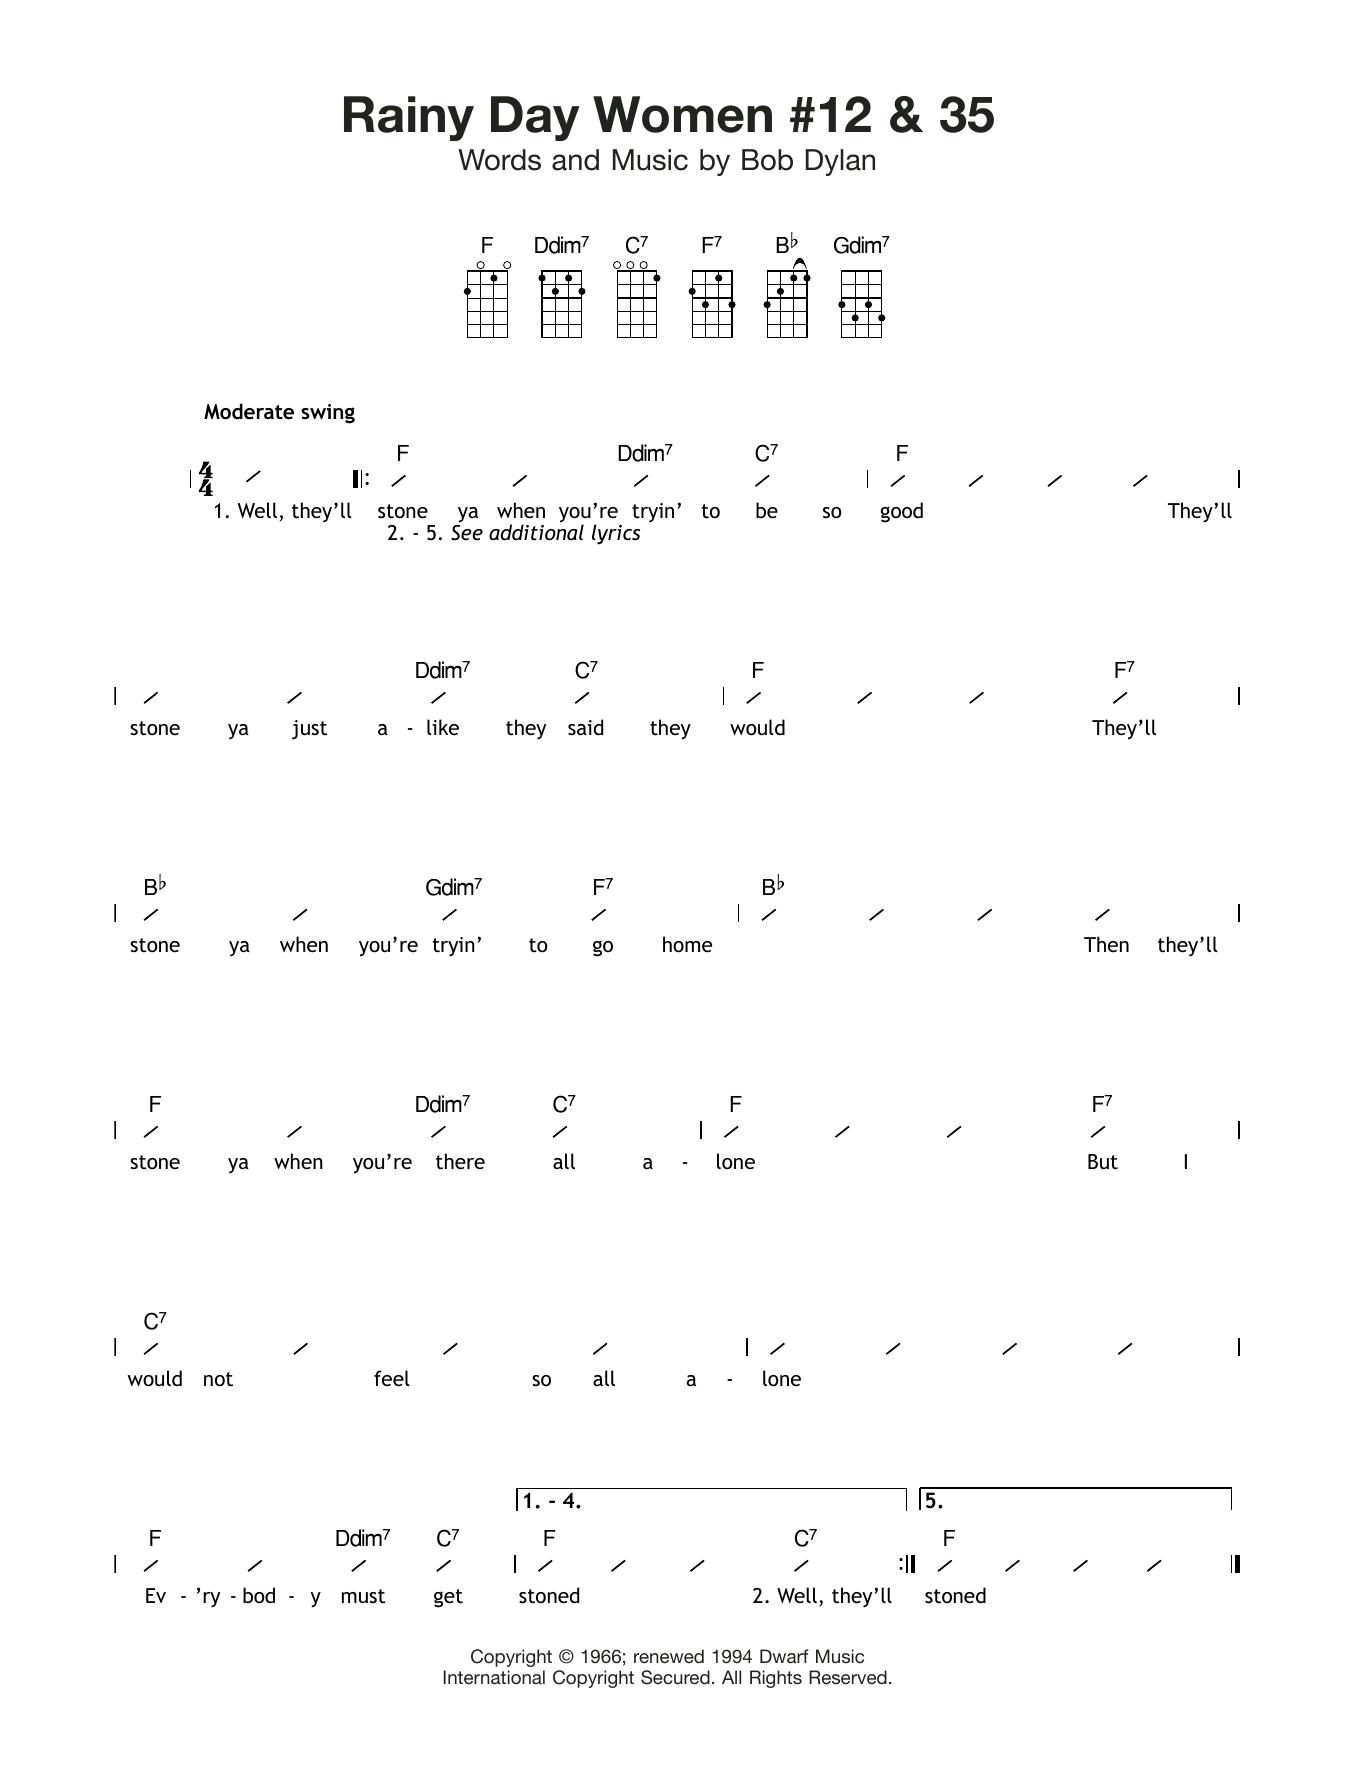 Rainy Day Women #12 and 35 Sheet Music